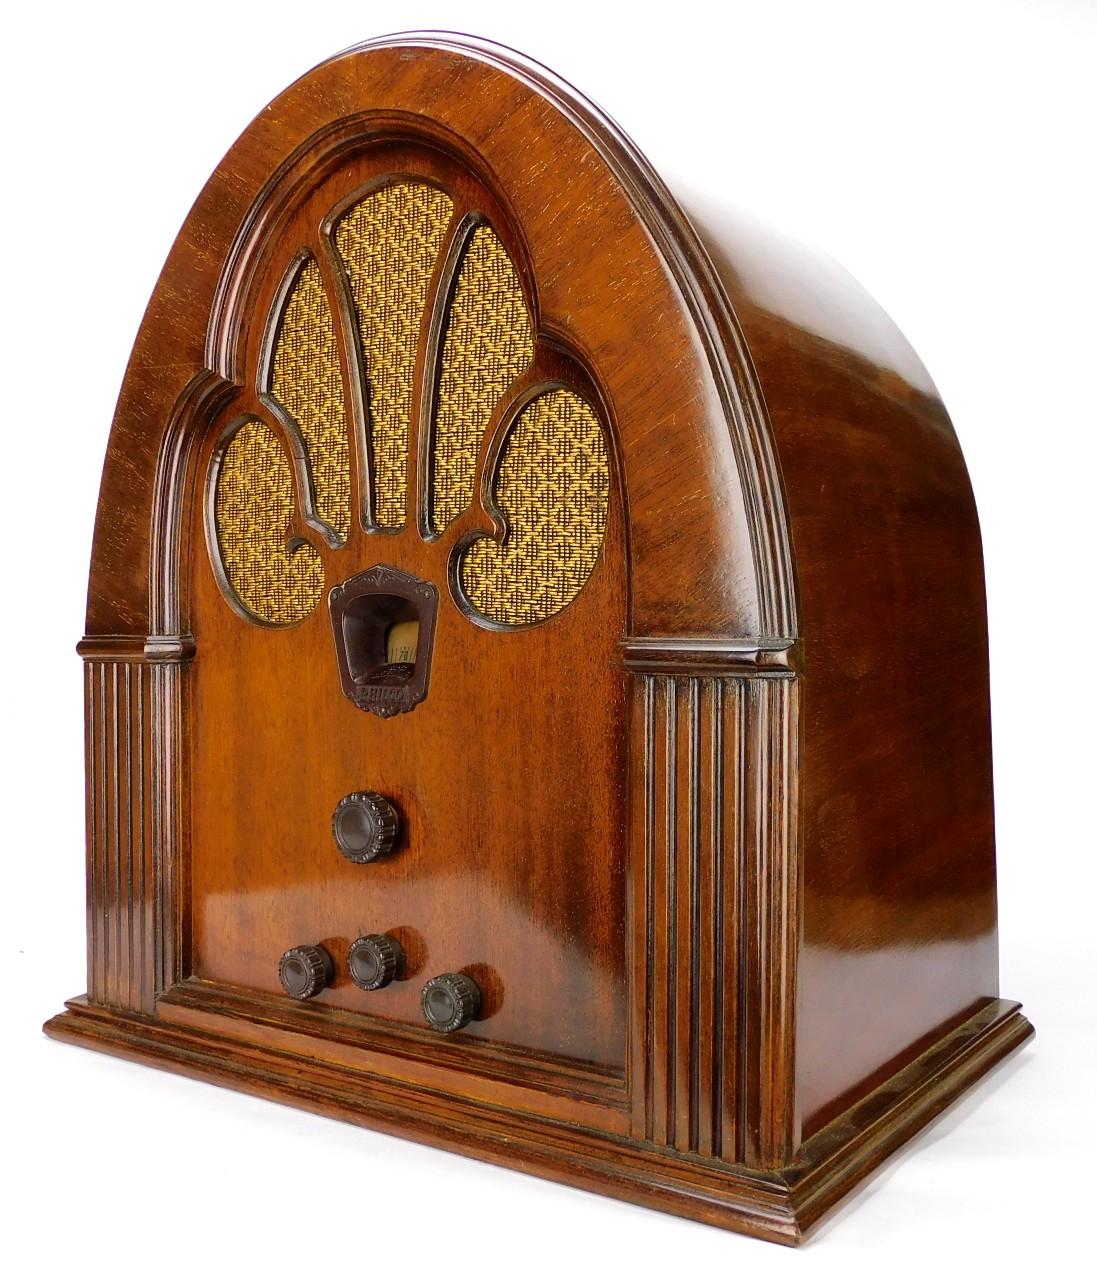 1930's Philco Model 70 Super Heterodyne Radio Refurbished